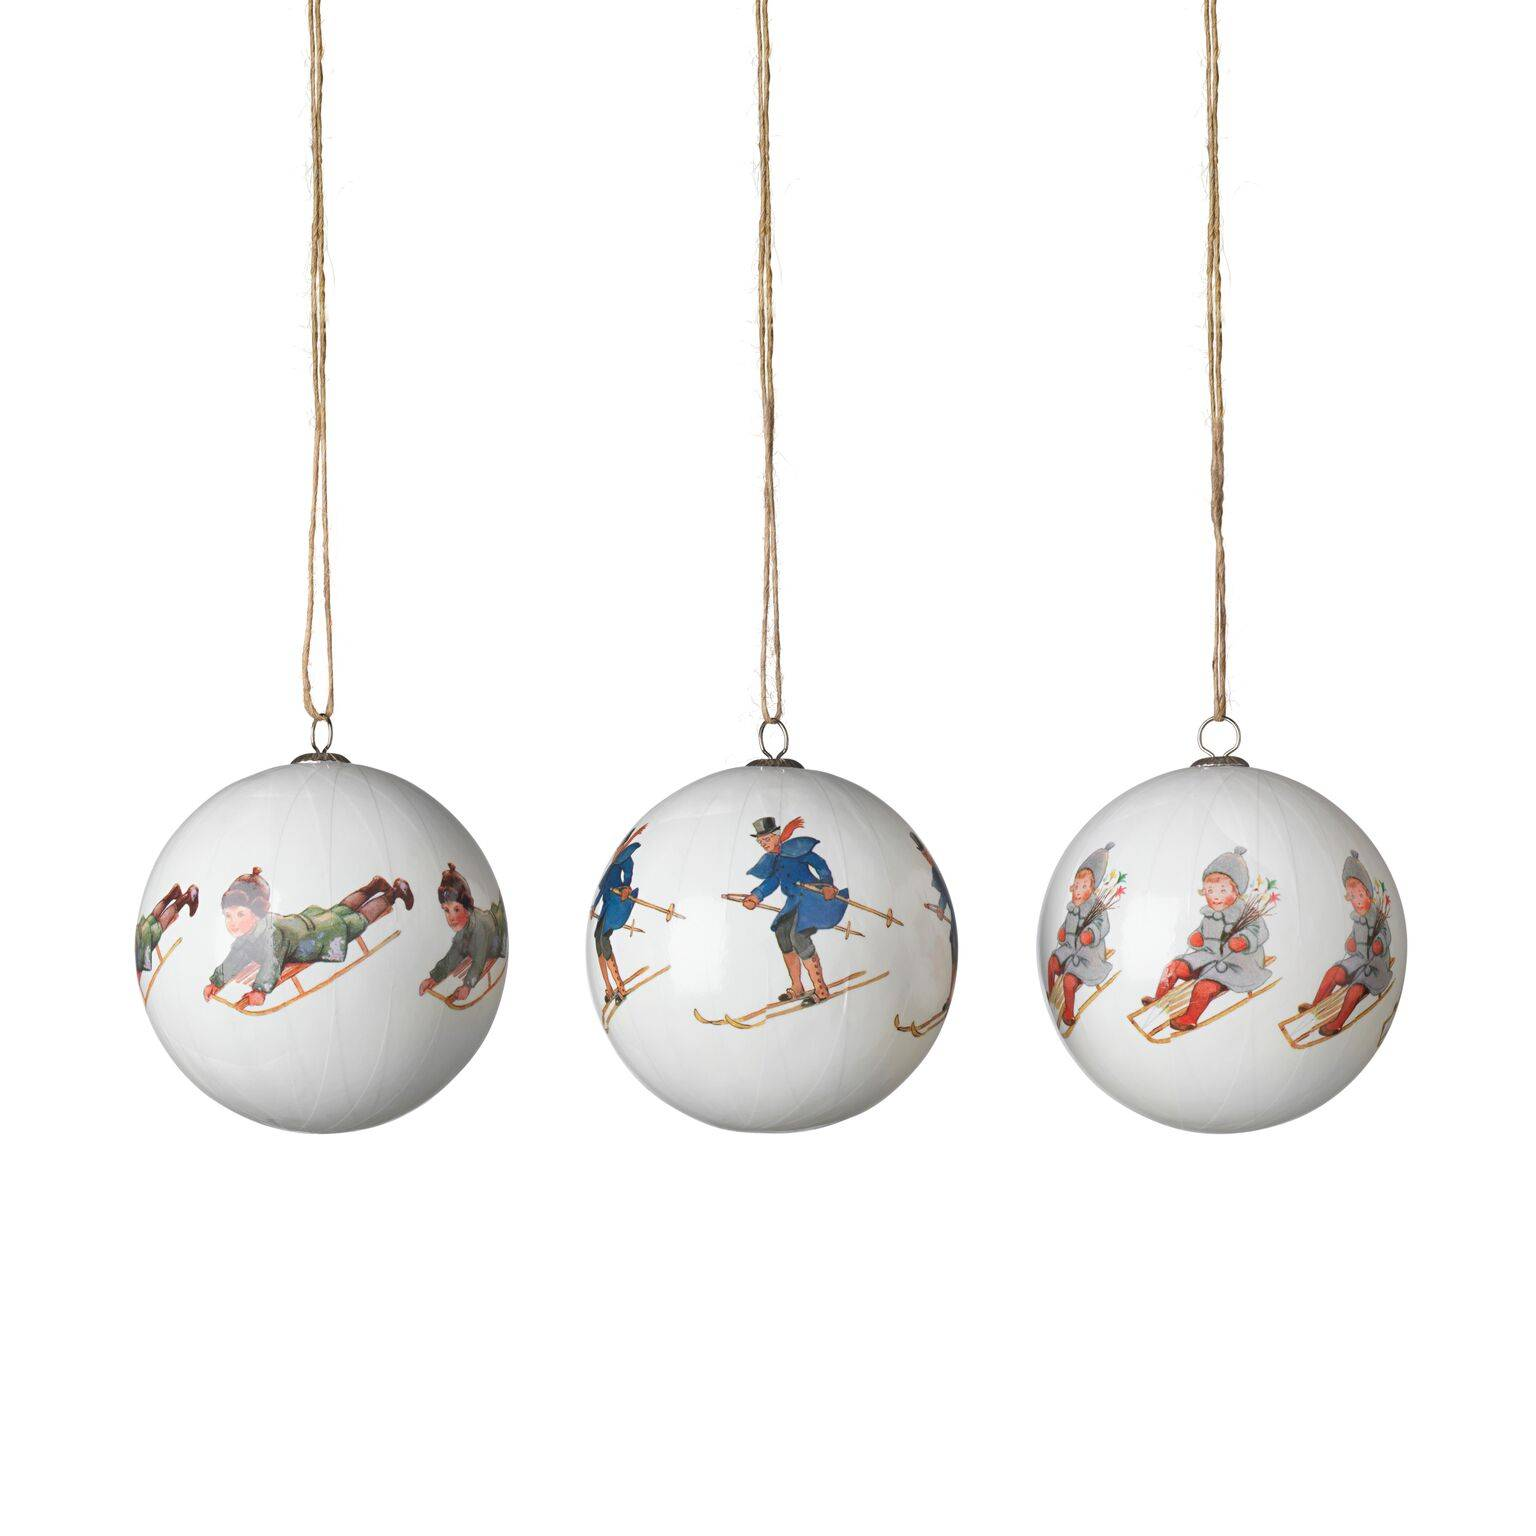 Design House Elsa Beskow Christmas Tree Ornaments, Uncle Blue & Co